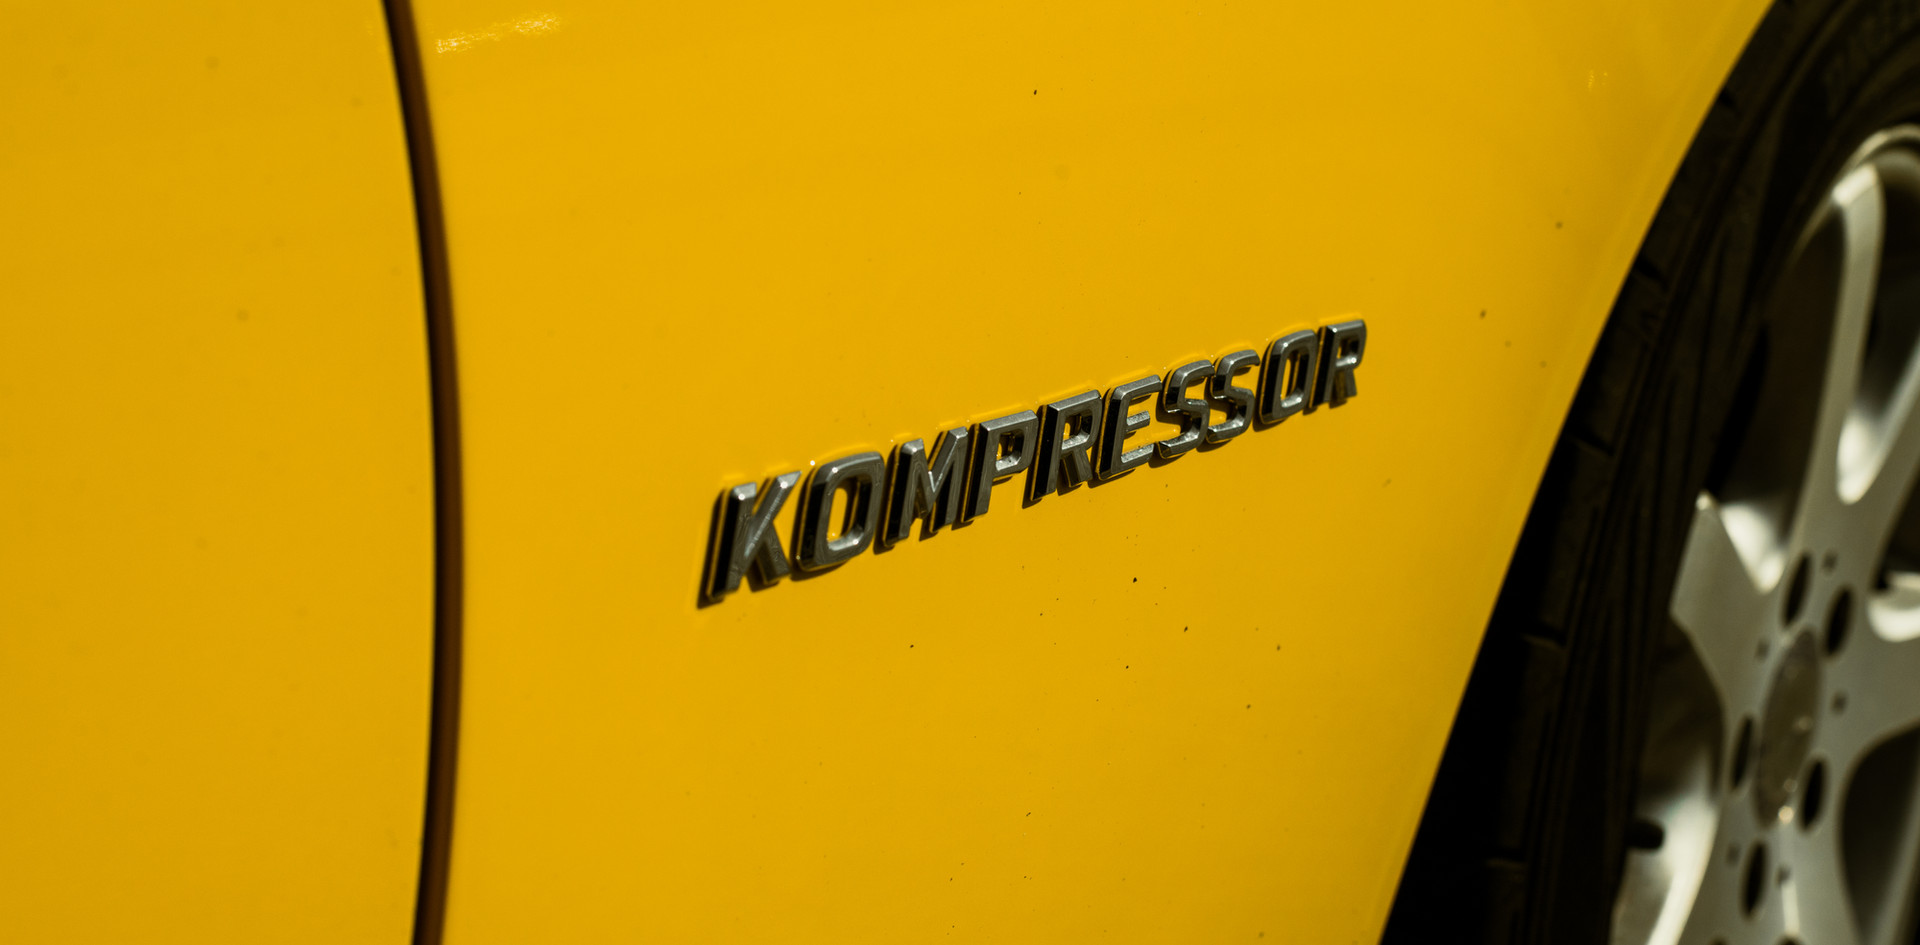 Kompressor (1 of 1).jpg